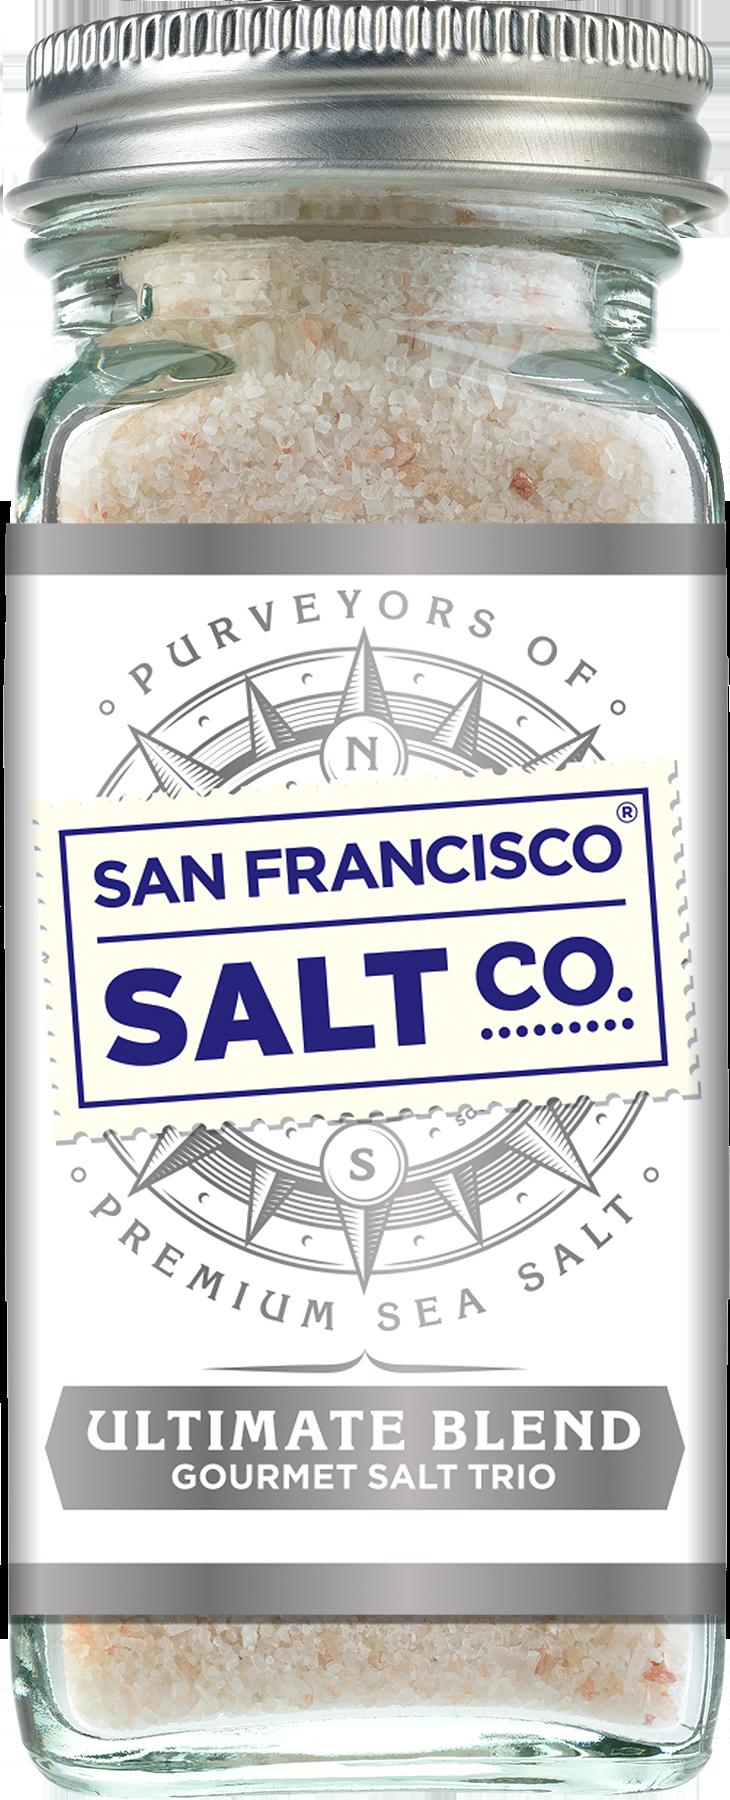 Ultimate Blend Gourmet Salt Trio